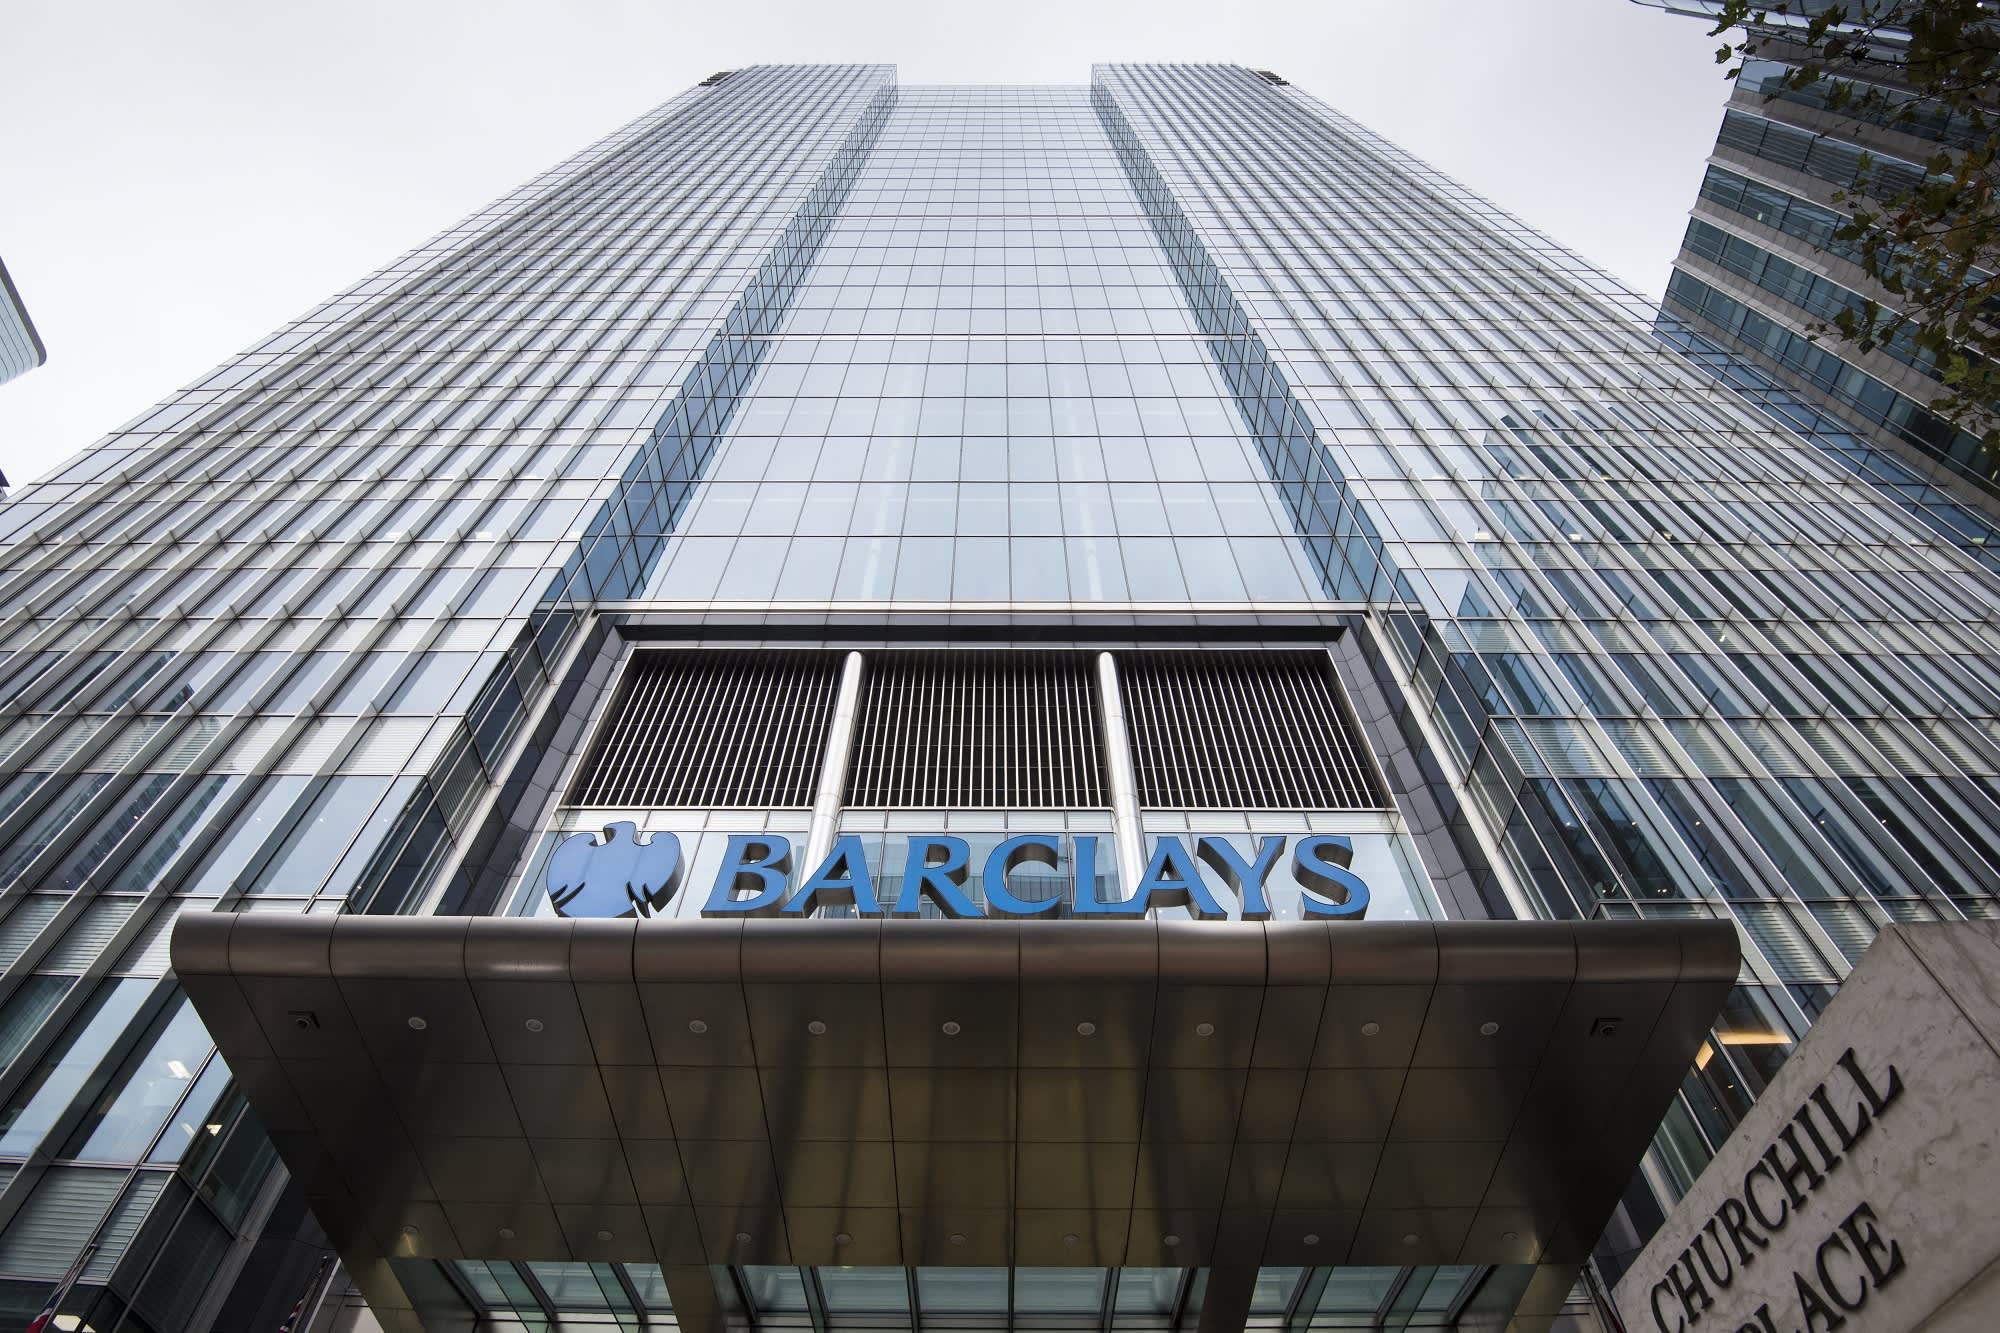 Barclays' second-quarter profit beats expectations amid Brexit uncertainty